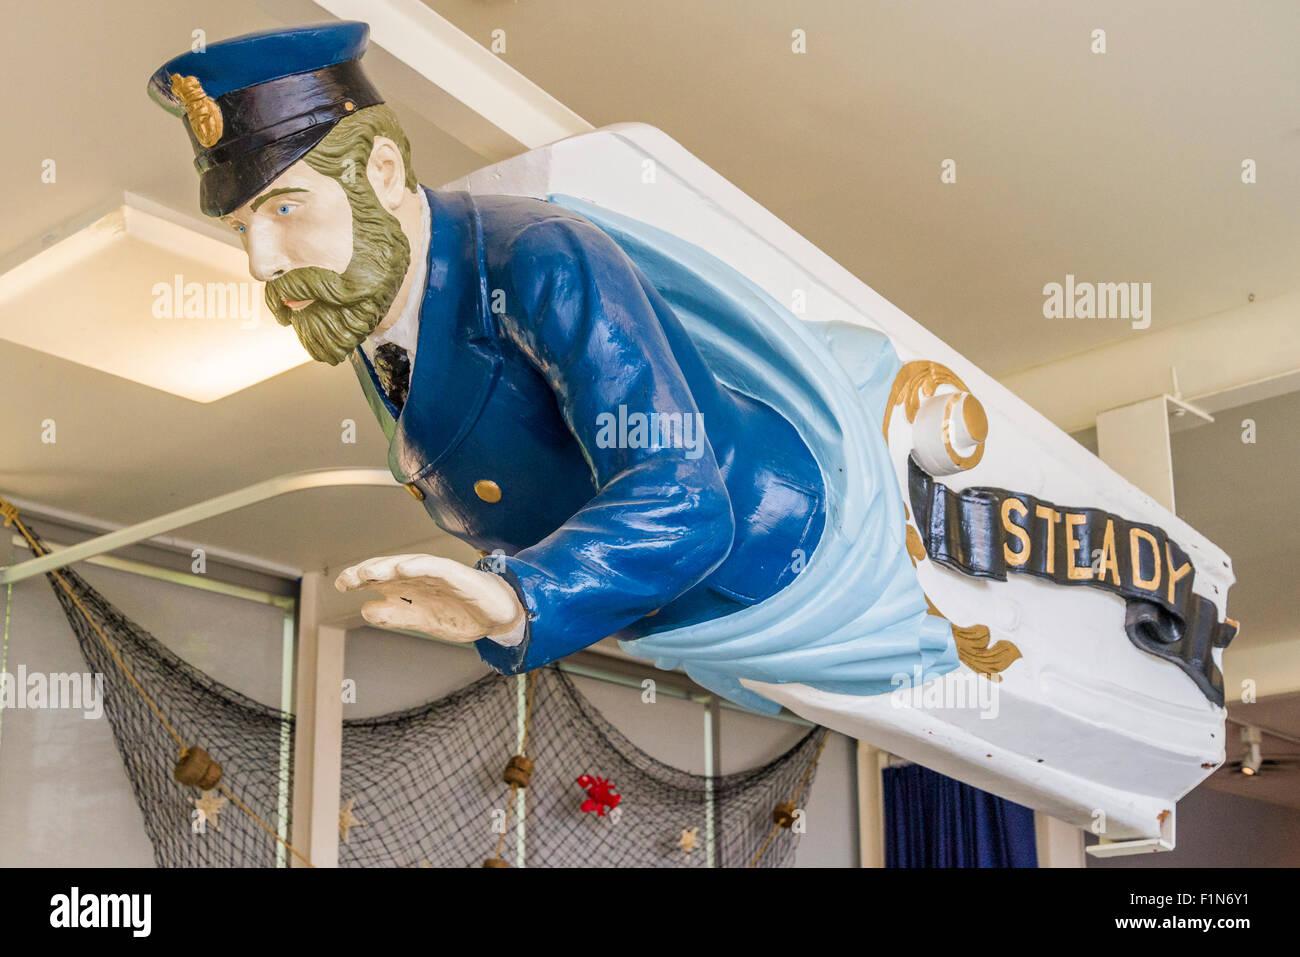 Ship's figurehead, Steady, the Maritime Museum, Vancouver, British Columbia, Canada - Stock Image